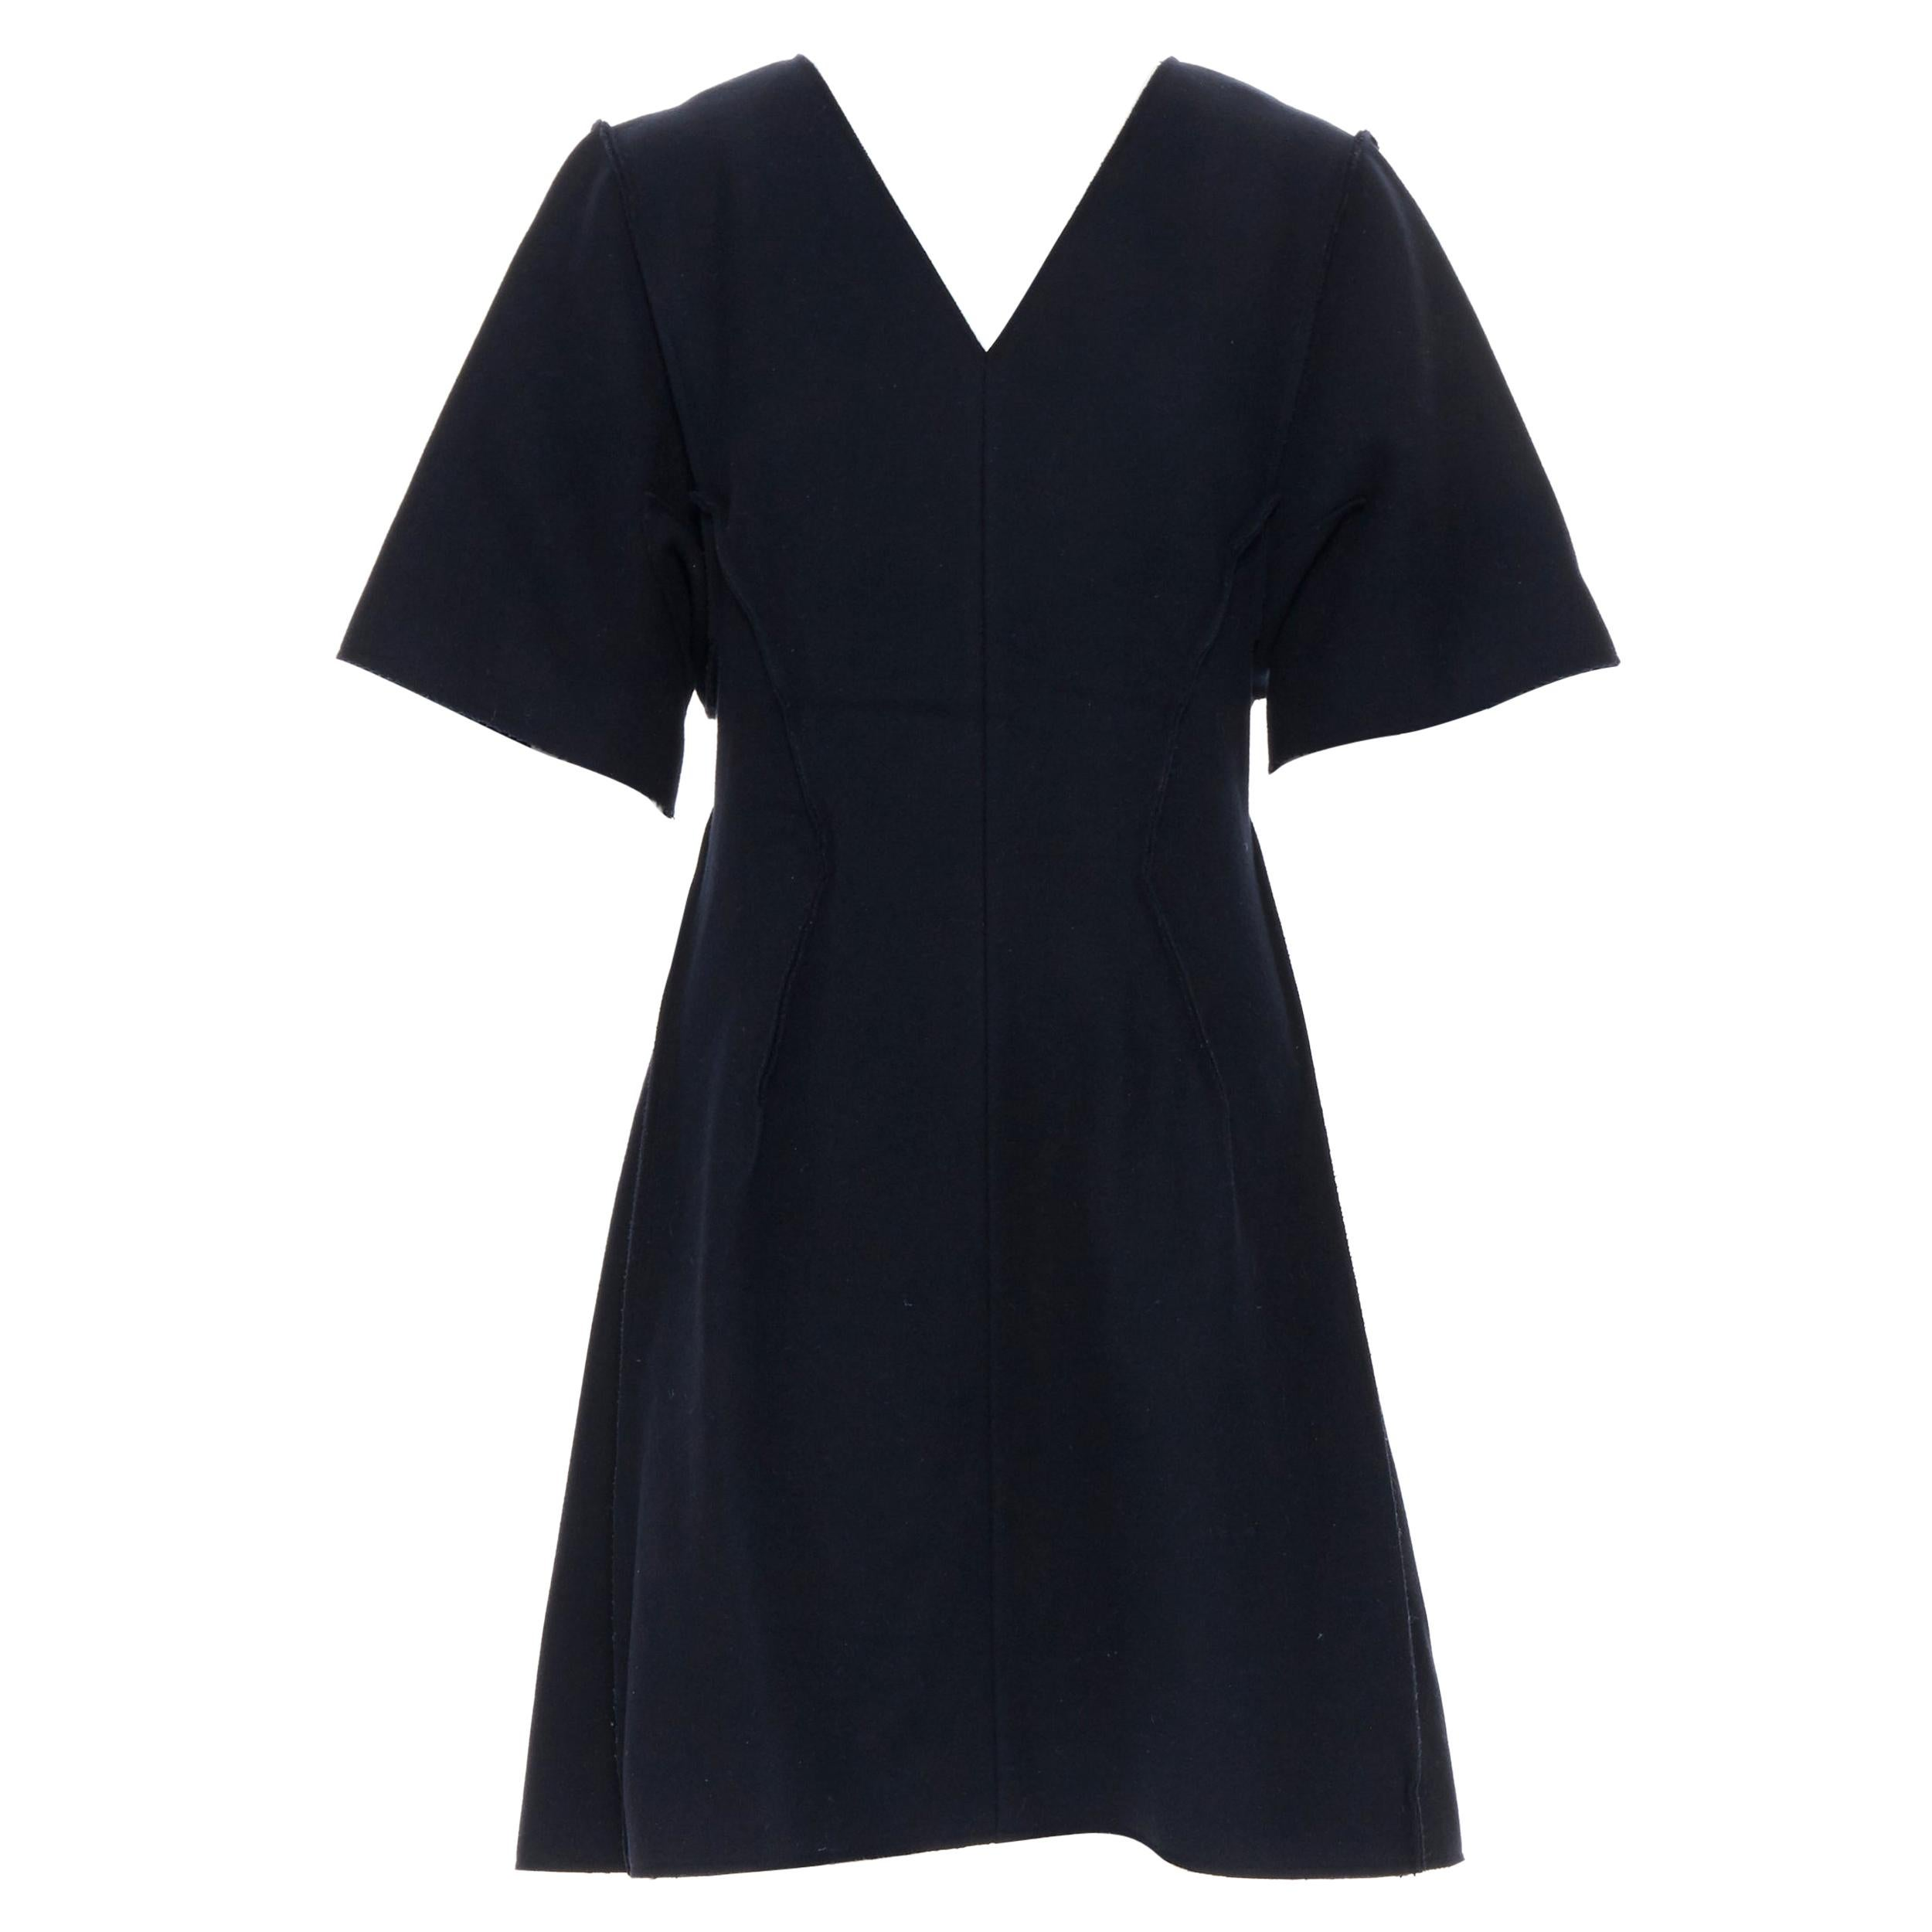 CHRISTIAN DIOR RAF lack wool felt reversed exposed seams flared dress FR42